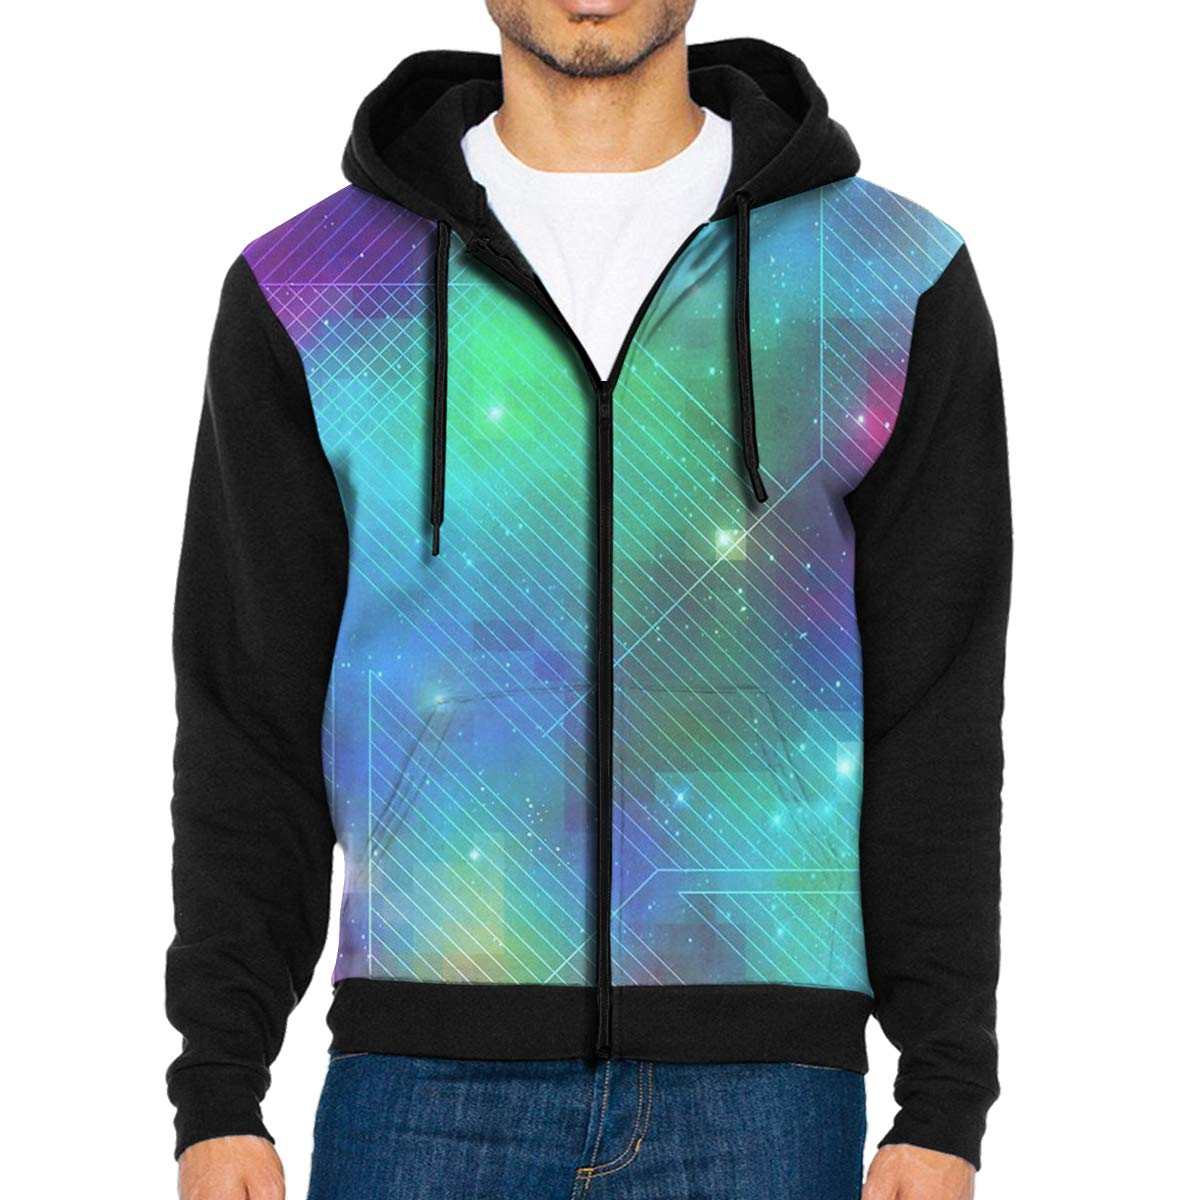 LXP FZD Mens Galaxy Line Fashion Hoodies Cool Jacket Print Zipper Sweatshirts Coat